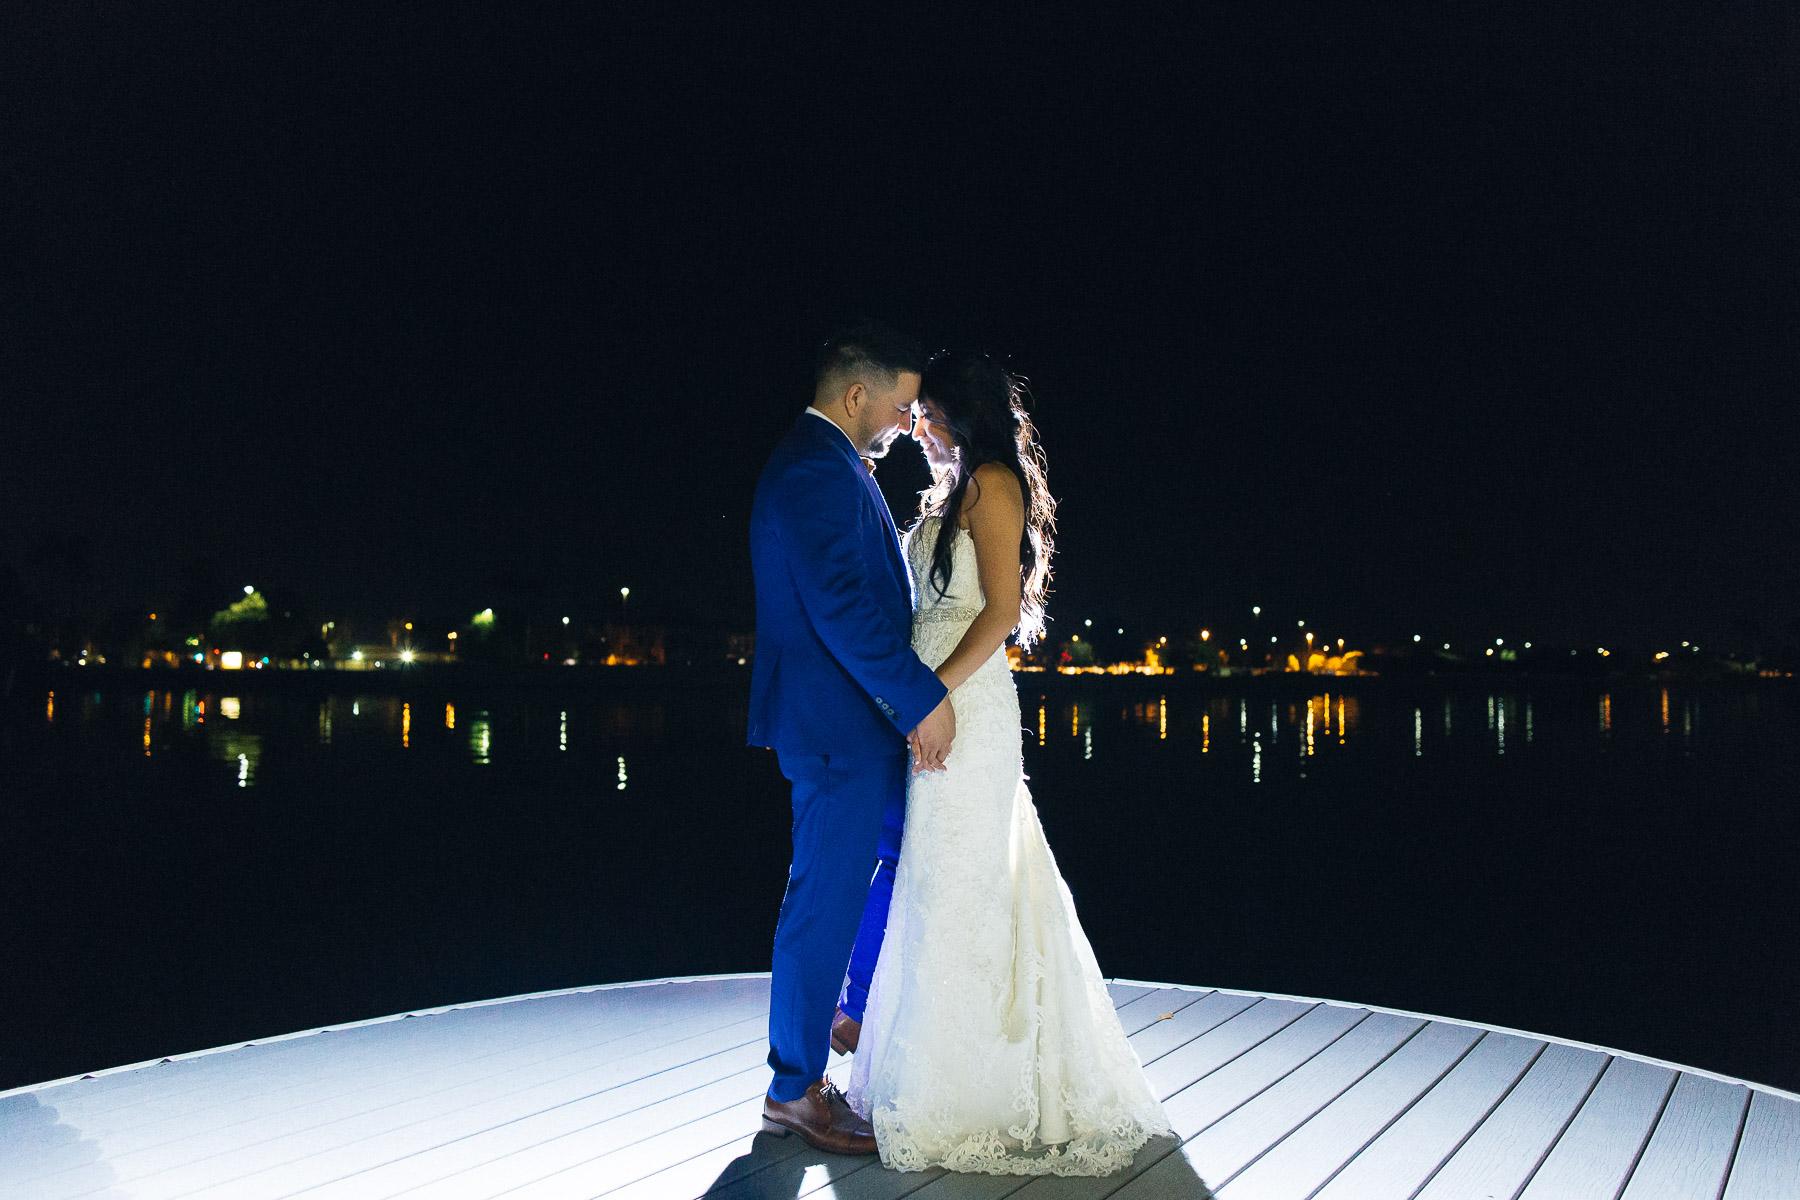 161029-Luxium-Weddings-Arizona-Jeff-Griselda-First-Look-Val-Vista-Lakes-Gilber-087a.jpg